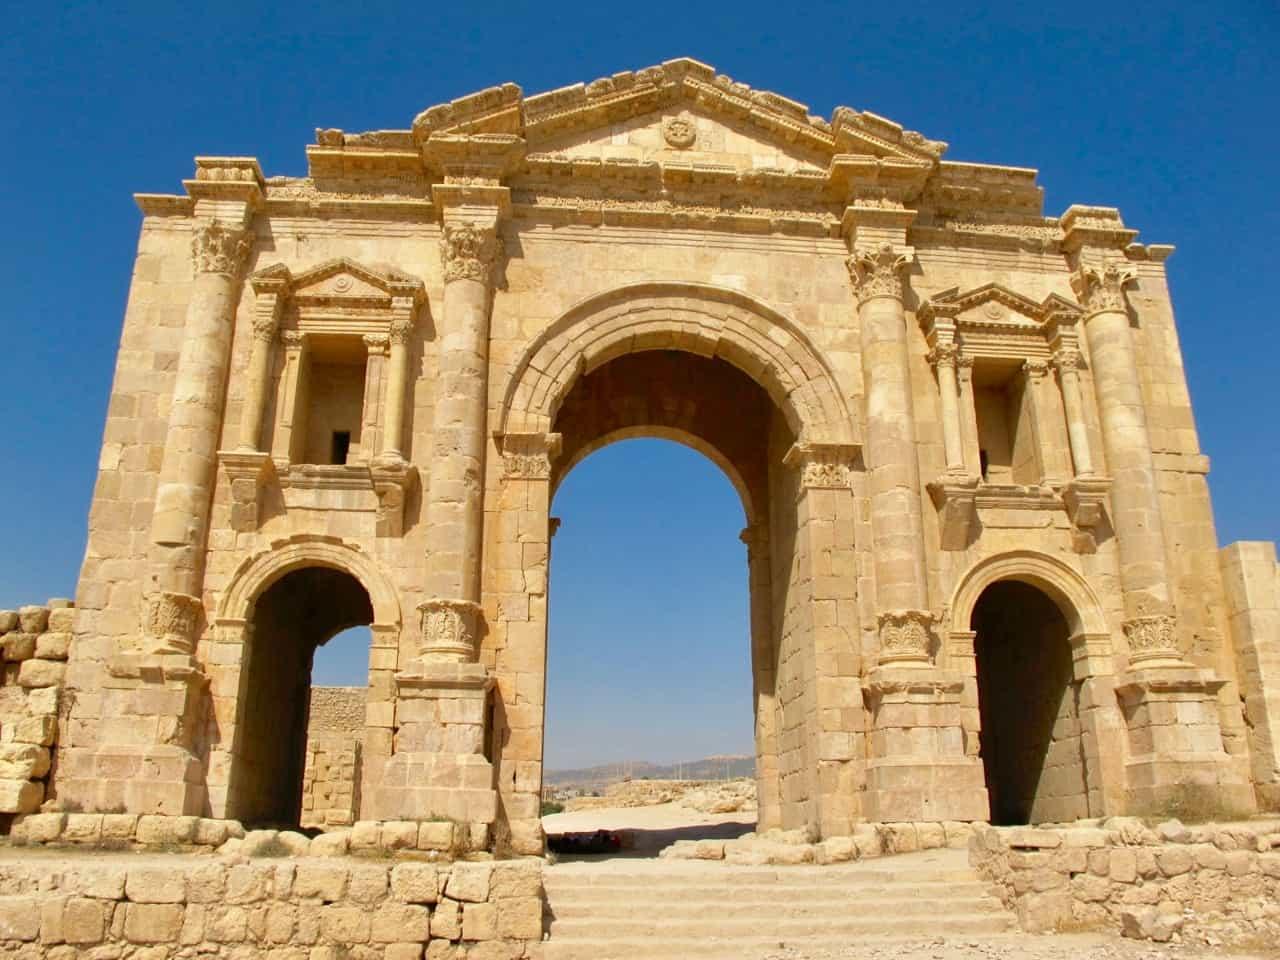 hadrians-arch-jerash-jordan-photo